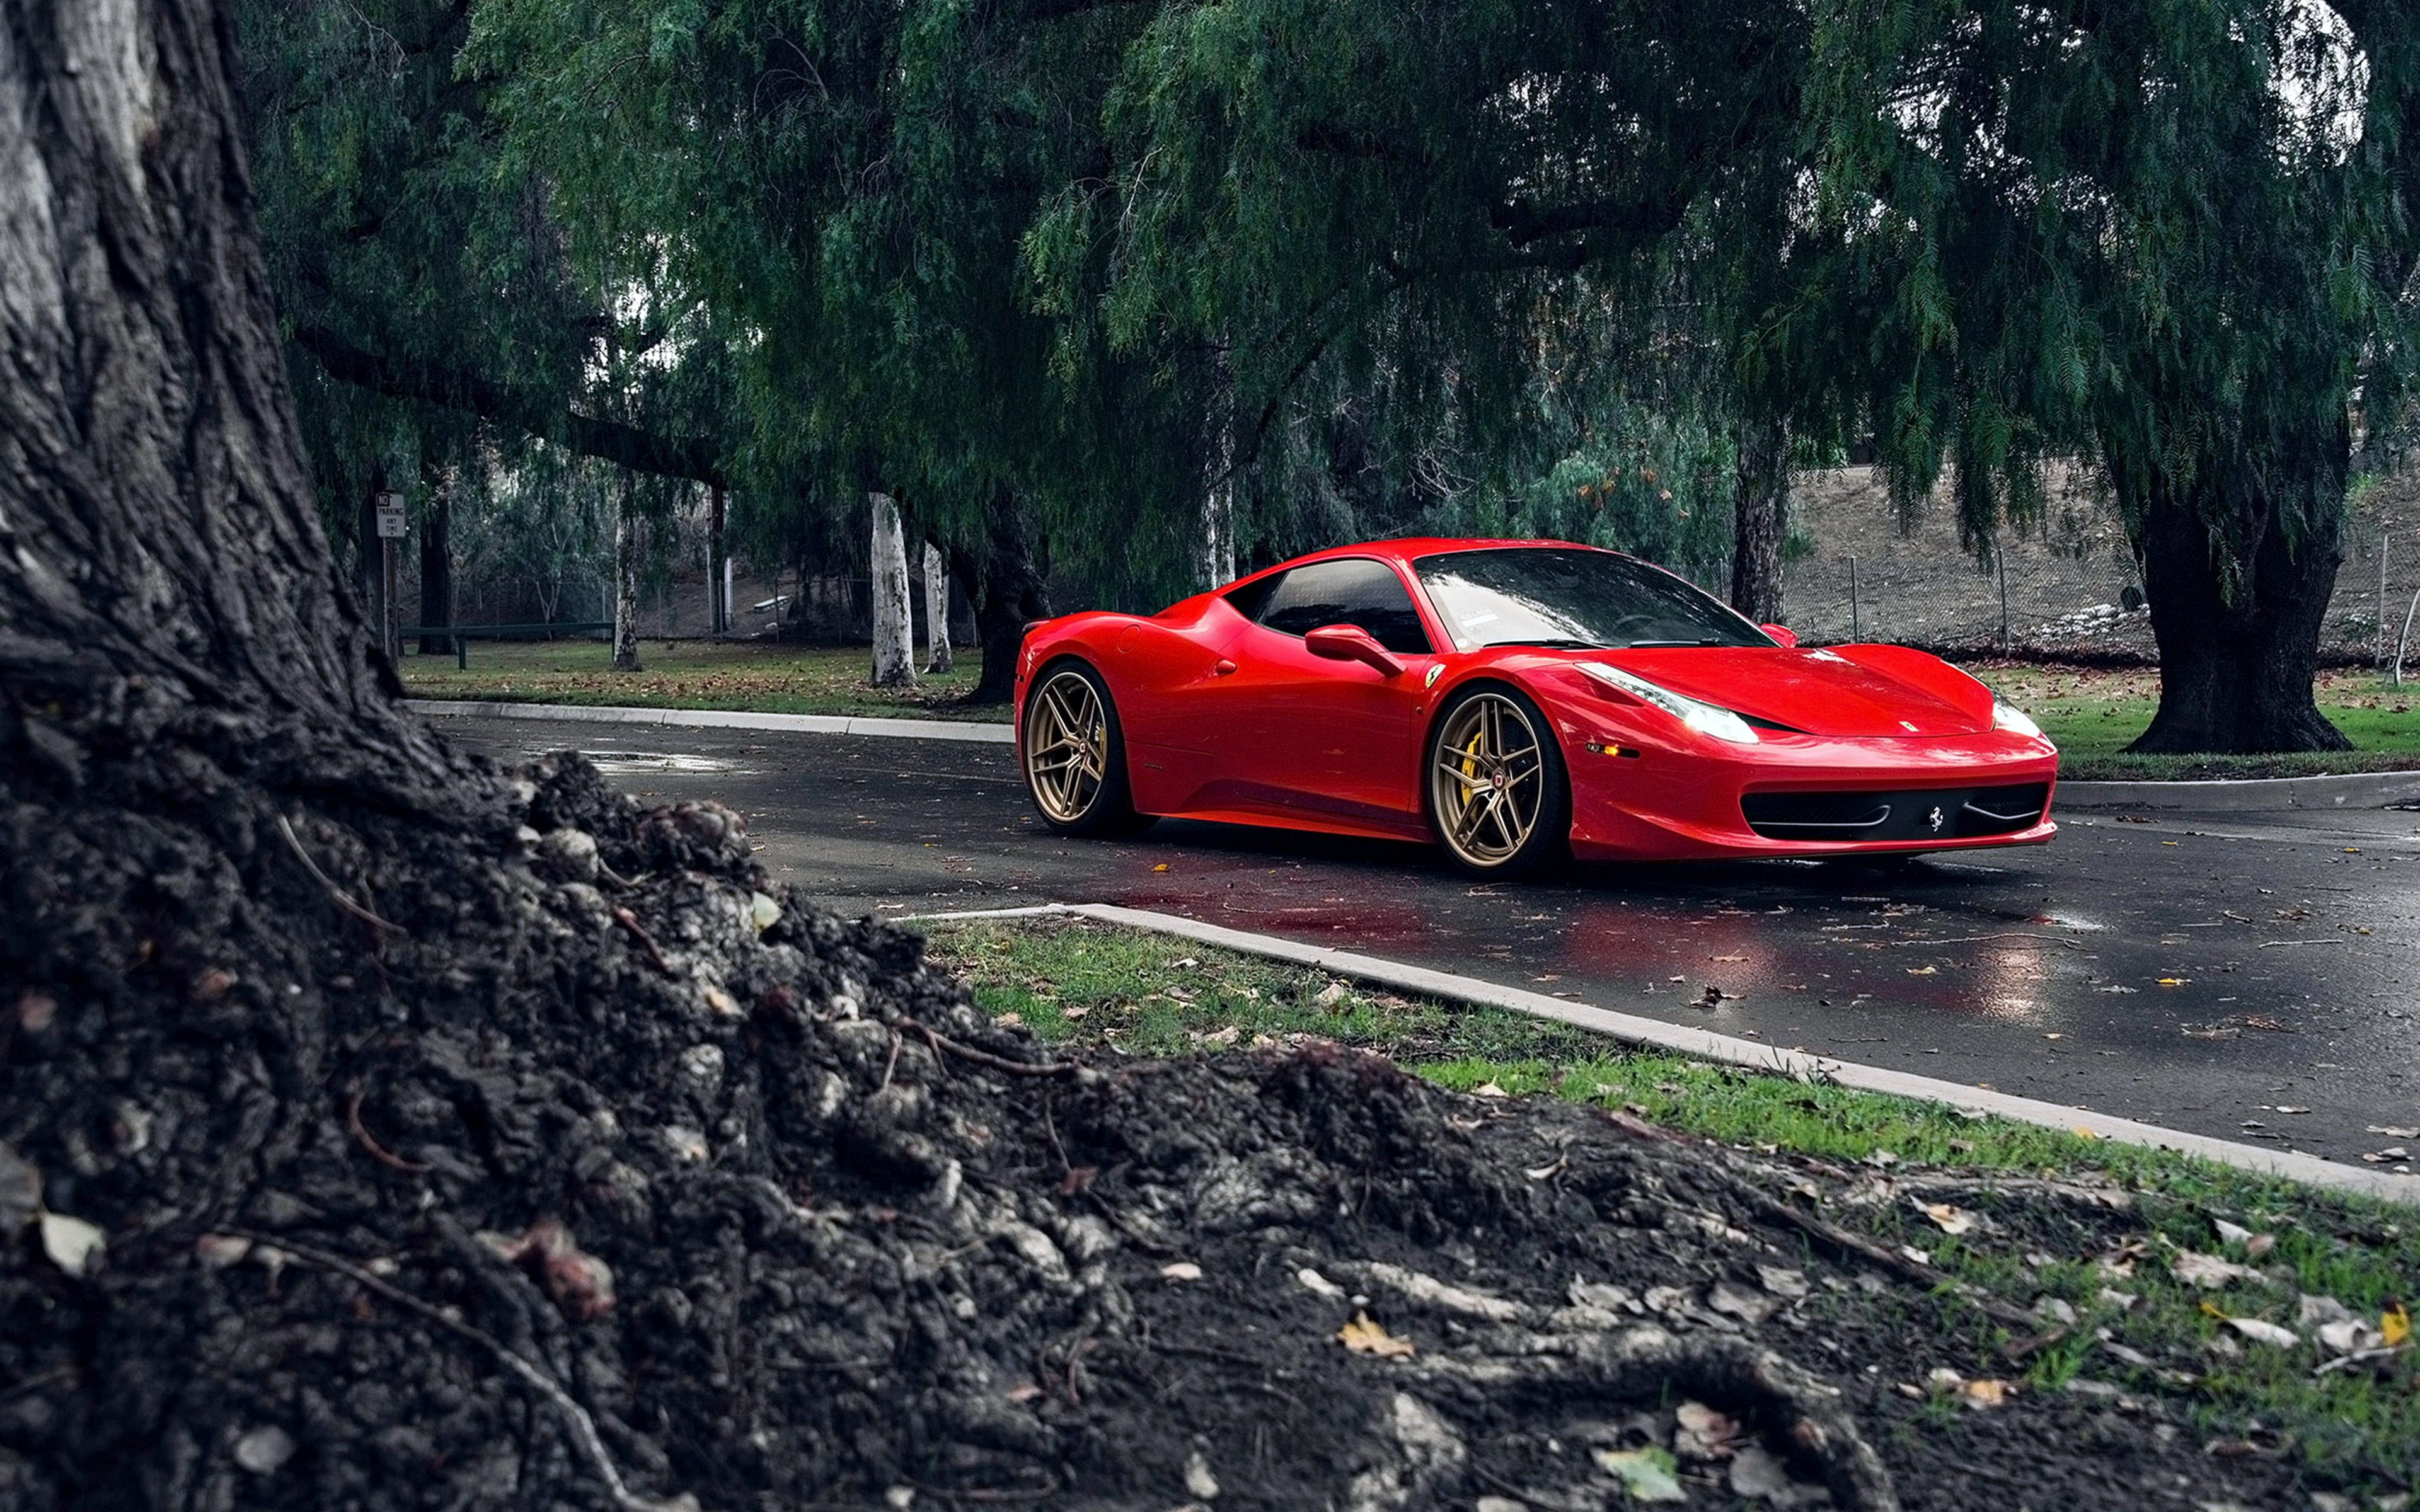 Ferrari Italia Klassen Id Tuning Supercars Red Cars Road Trees